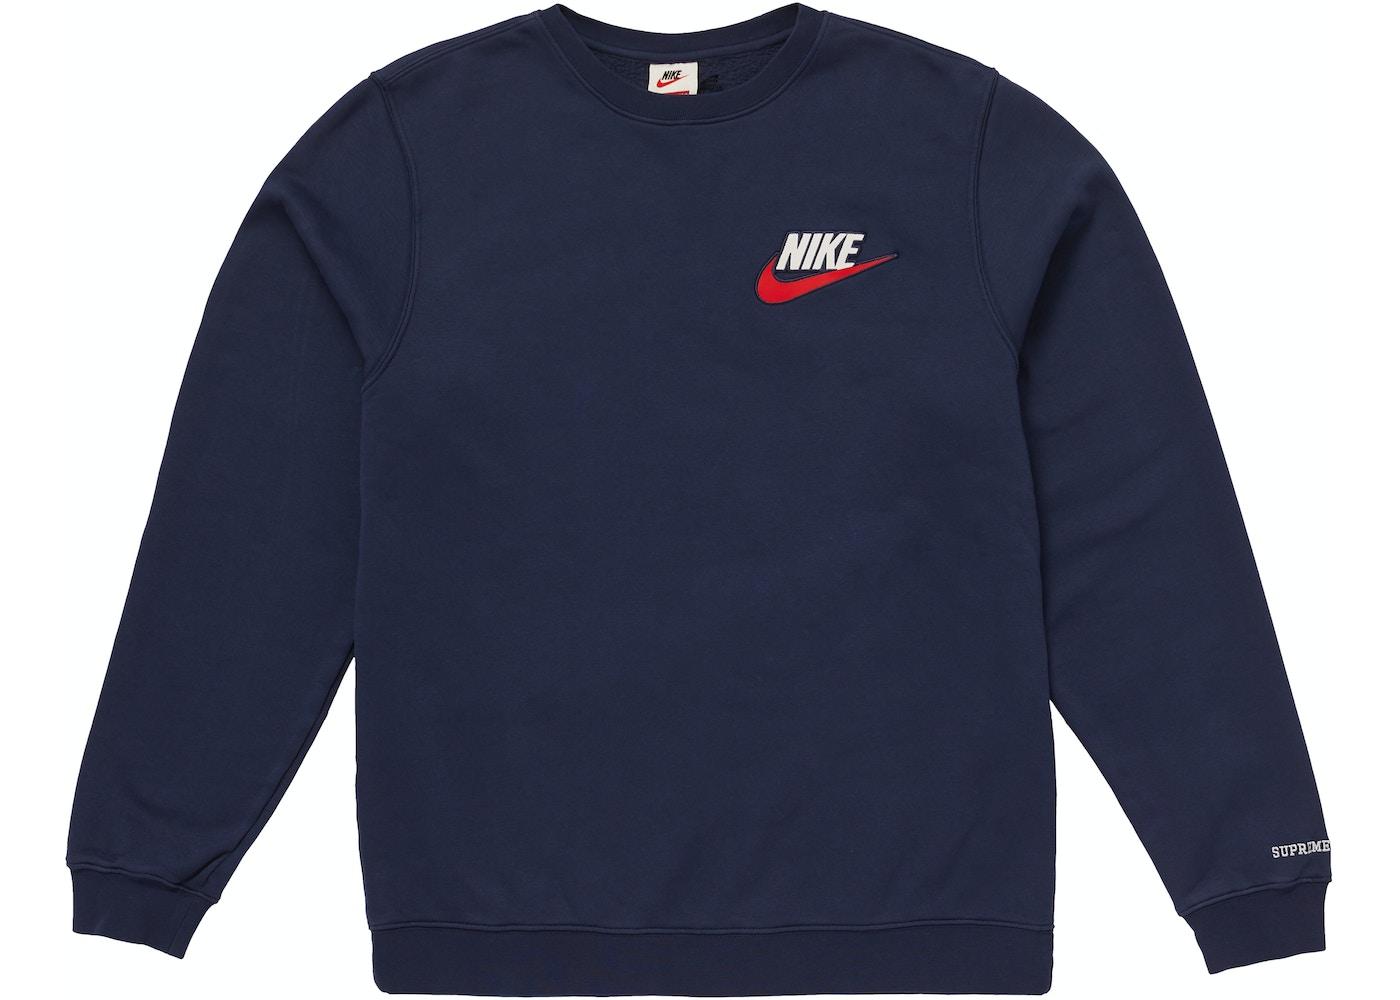 157756e5 Supreme Nike Crewneck Navy - FW18